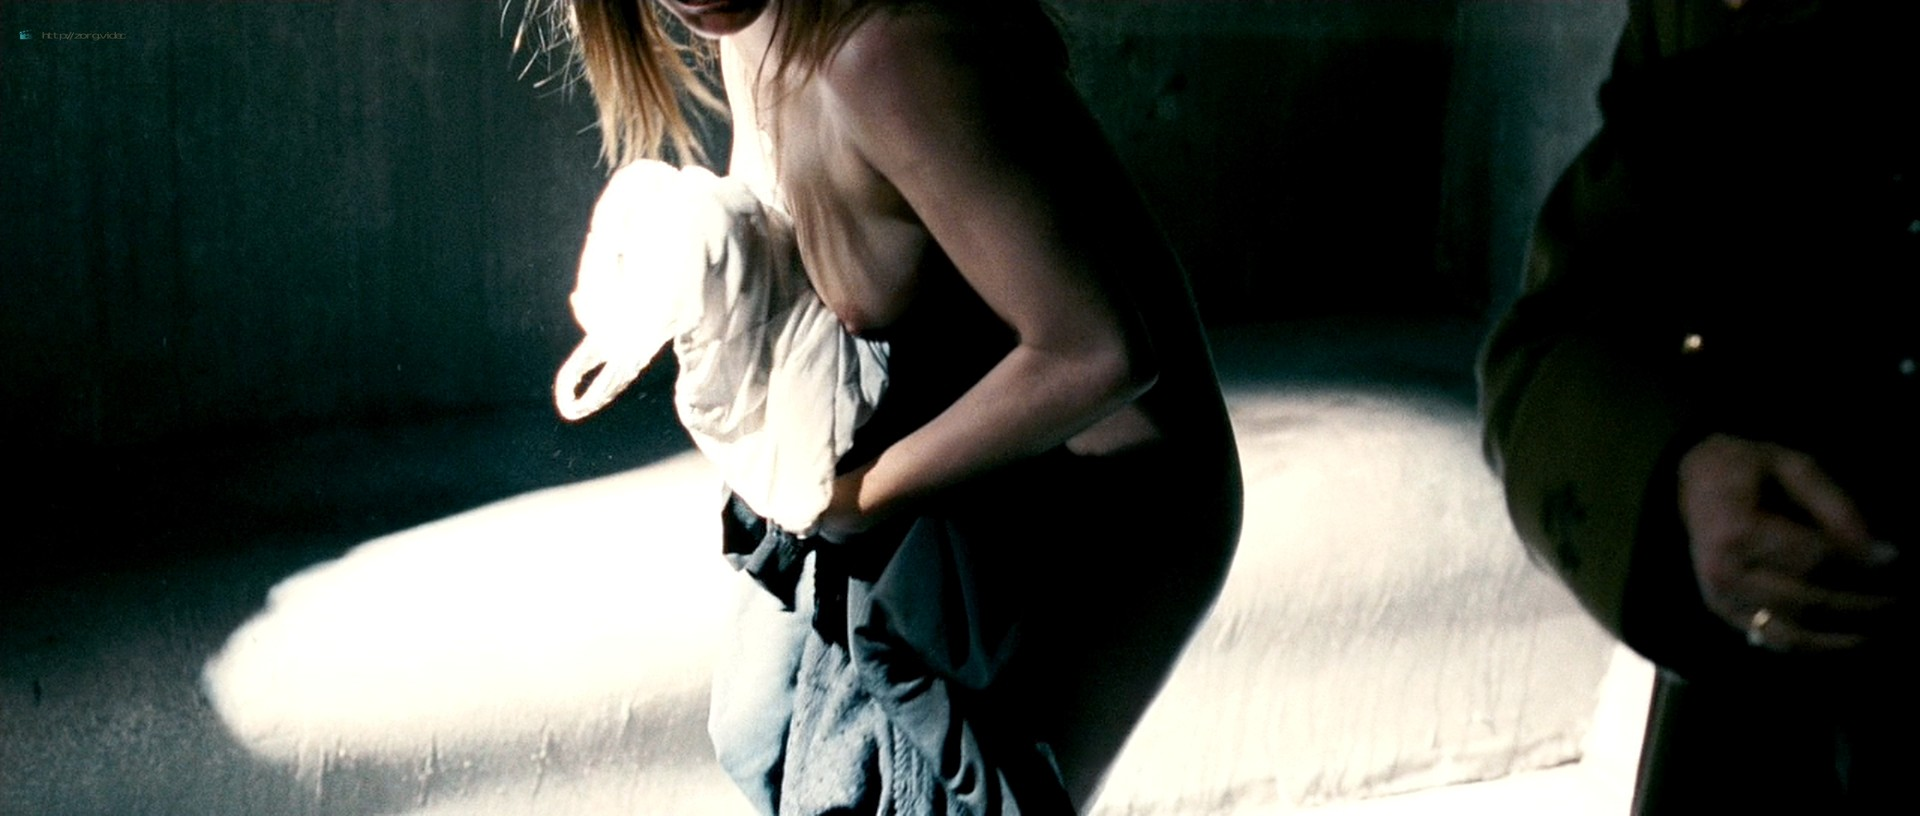 Maria Leon nude in - La voz dormida (2011) HD 1080p BluRay (3)